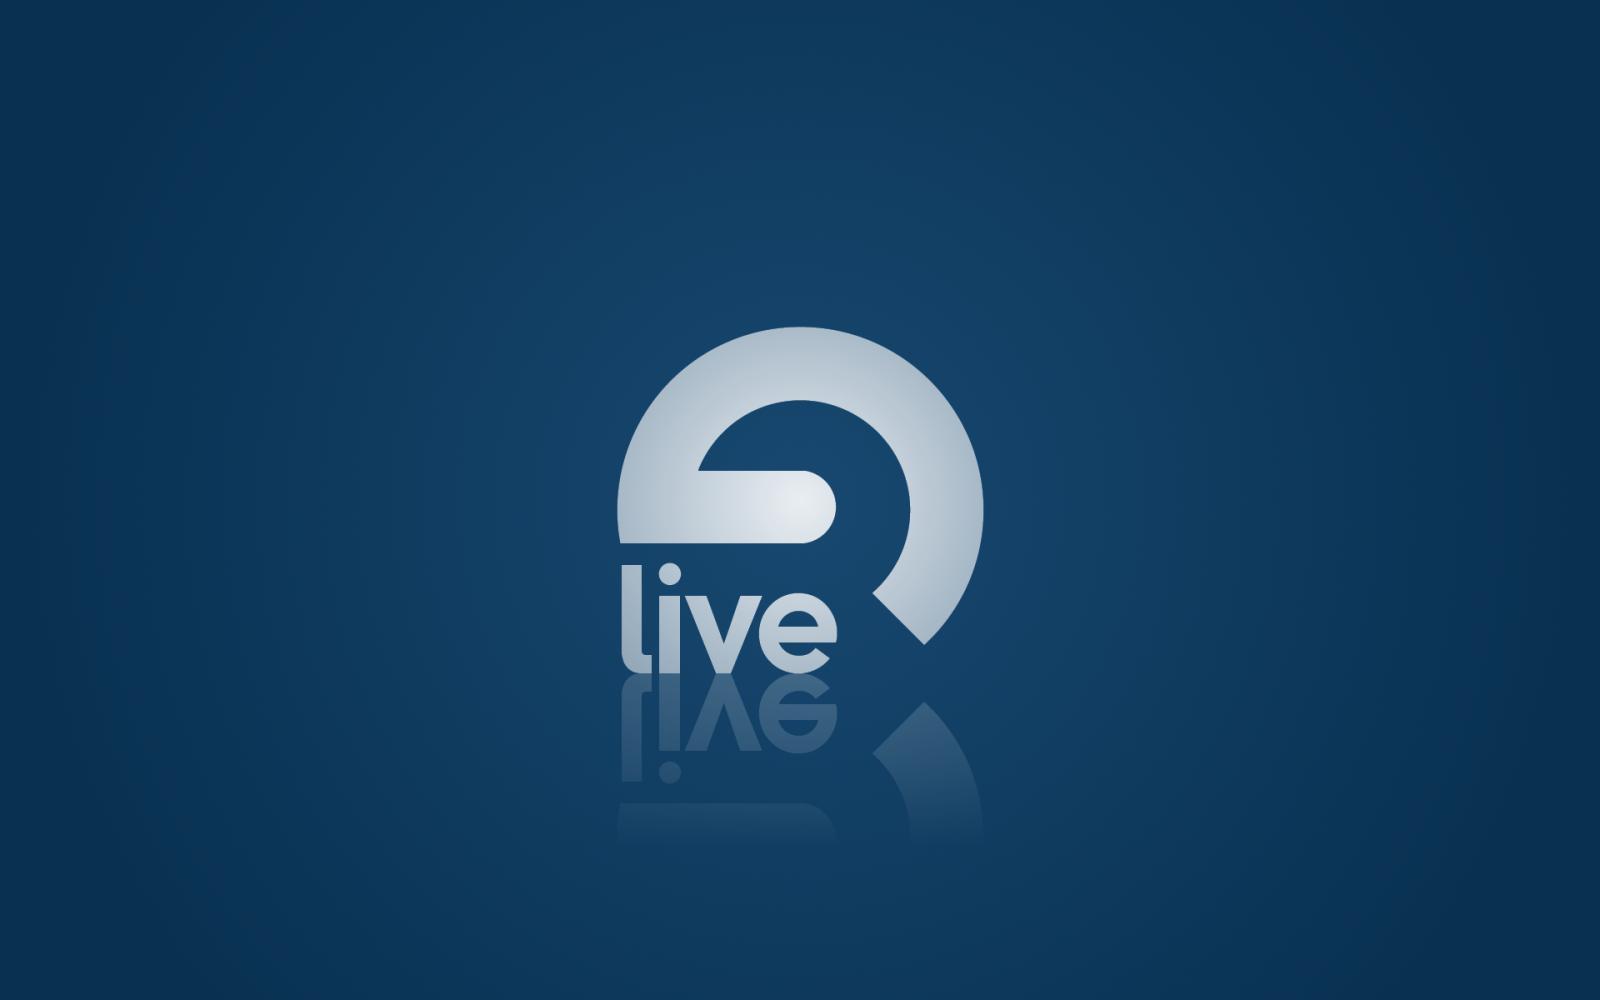 Download Ableton Live Wallpaper 1600x1000 HD Wallpapers   4199758 1600x1000